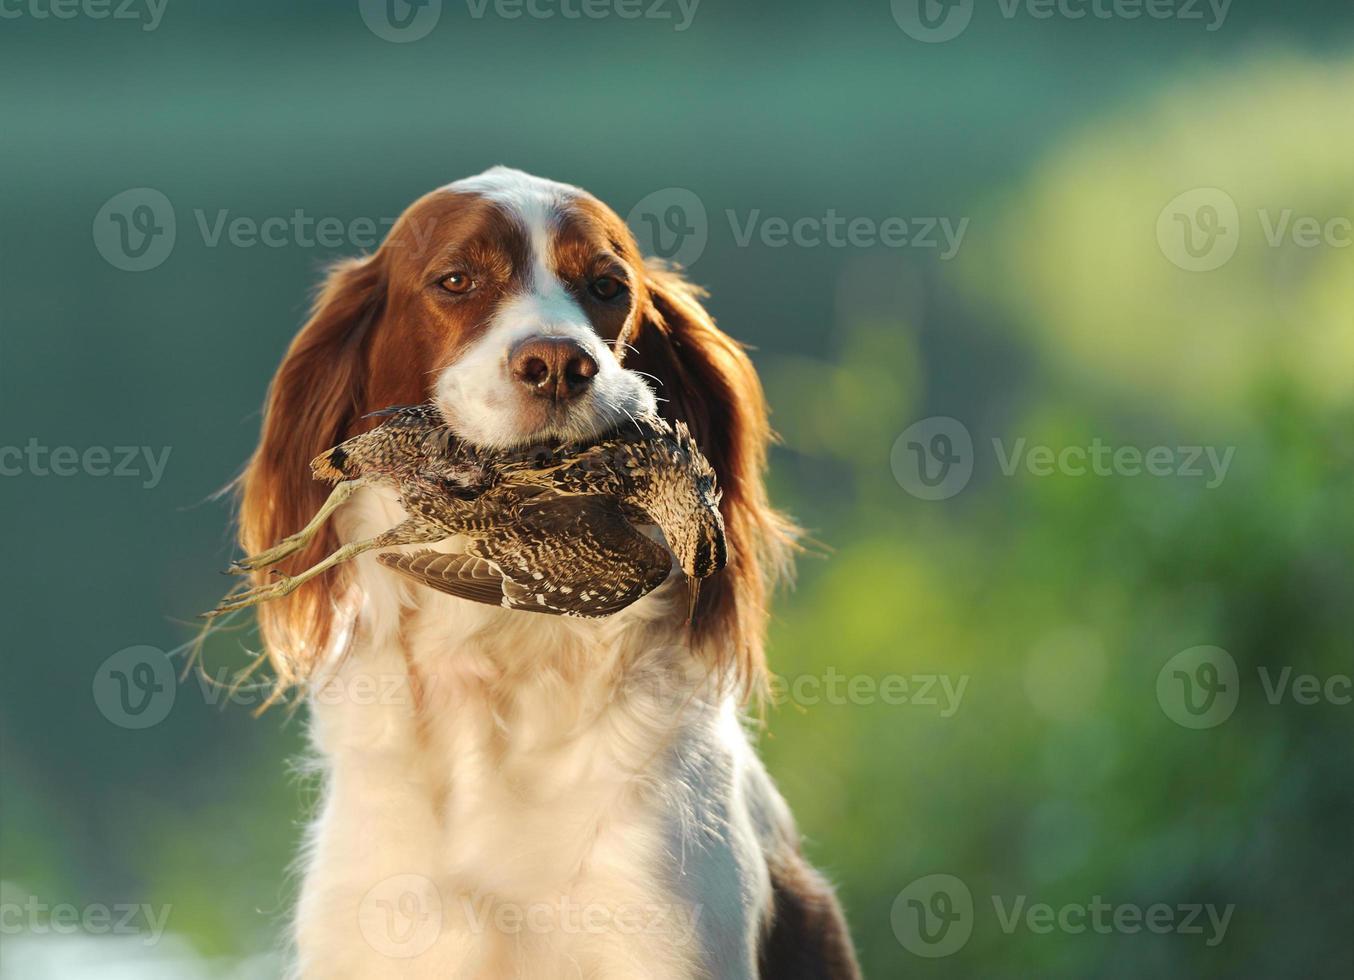 jakt hund innehav i tänder snipe foto